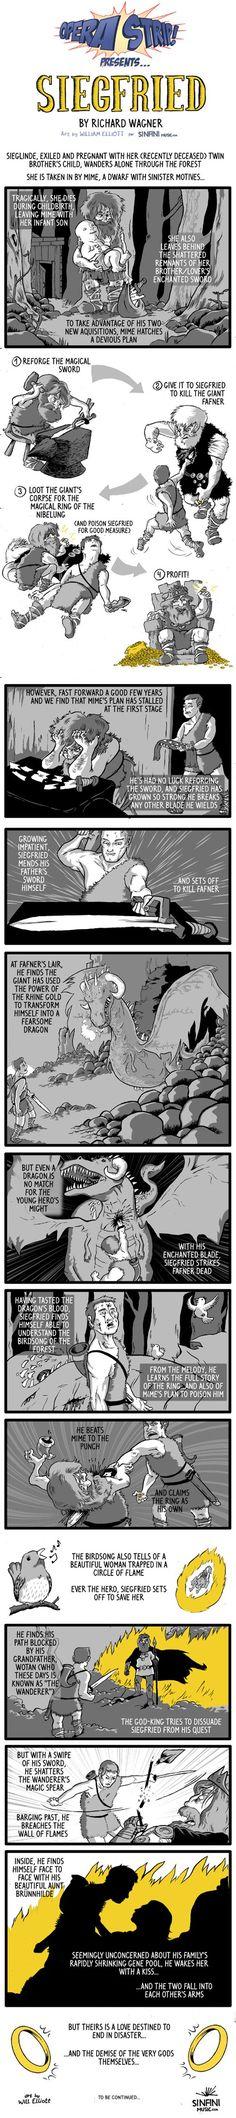 Ring Cycle 3: Siegfried - An Opera by Richard Wagner. Opera Comic Strip Art by William Elliott